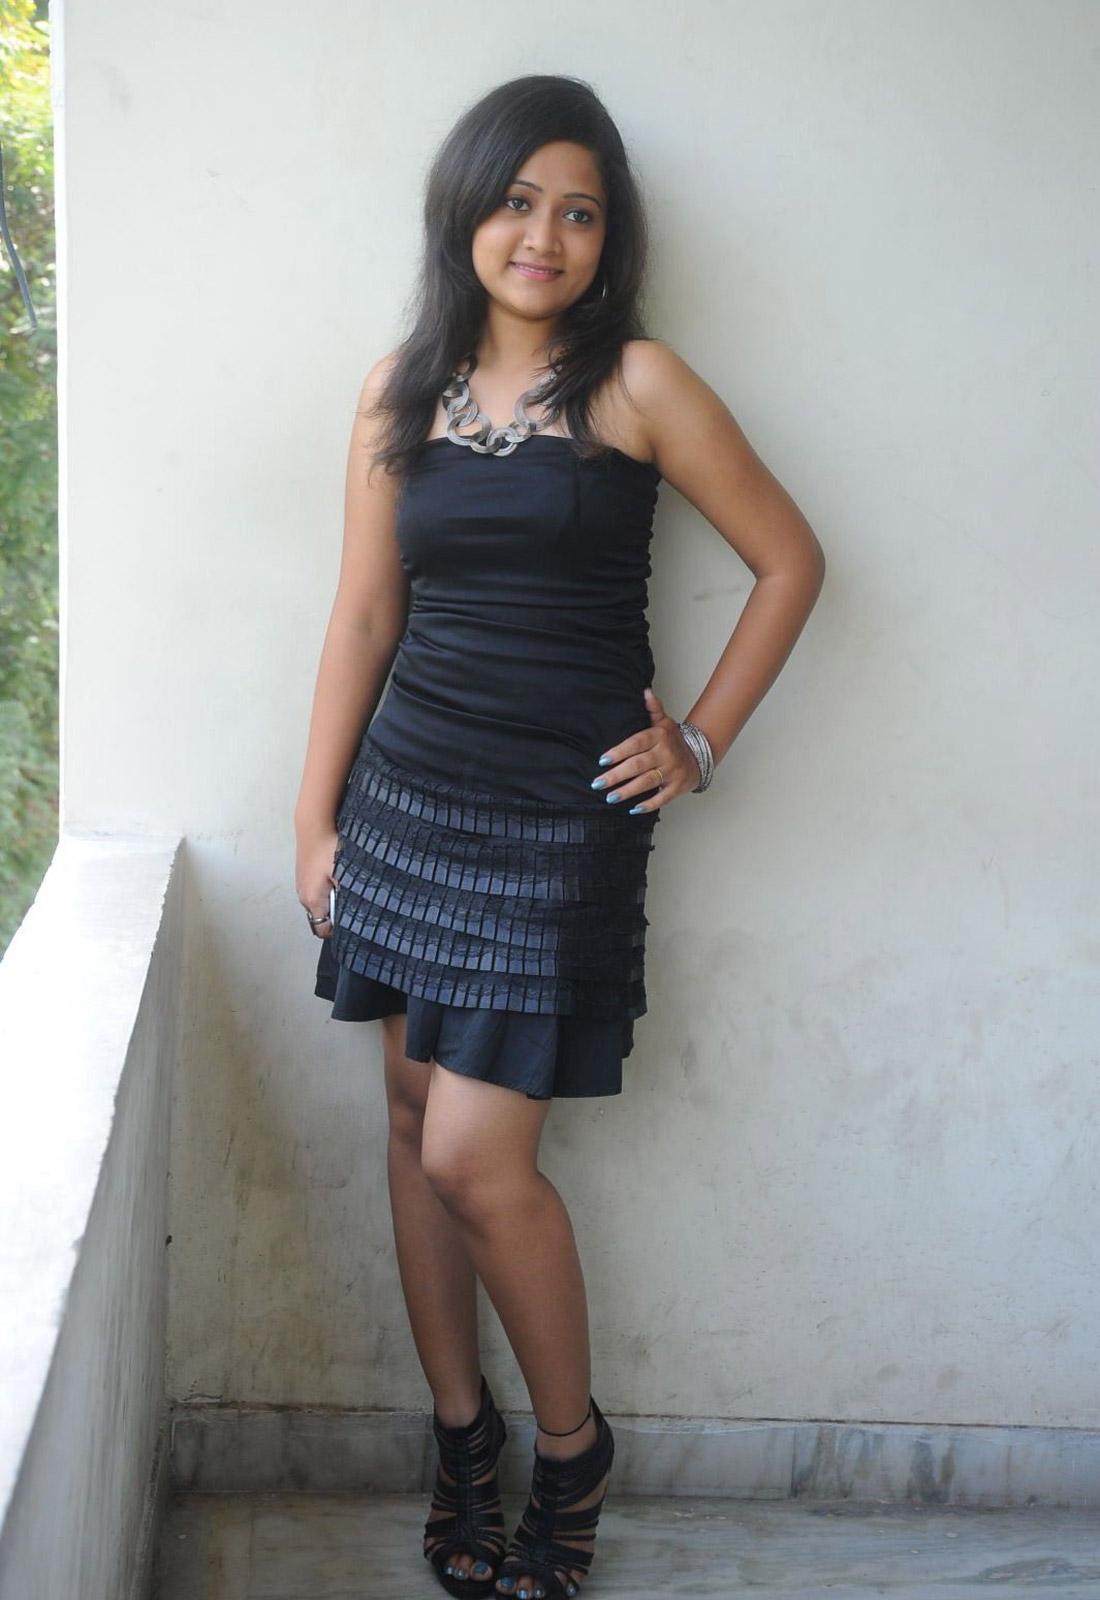 http://3.bp.blogspot.com/-pNKUsU3oMnw/UFKPIaI2CjI/AAAAAAAAzKE/yGIT5p0kiP8/s1600/Sindhu-Sri-Stills-at-Cool-Boys-Hot-Girls-Platinum-Disc-Function-%252831%2529.jpg